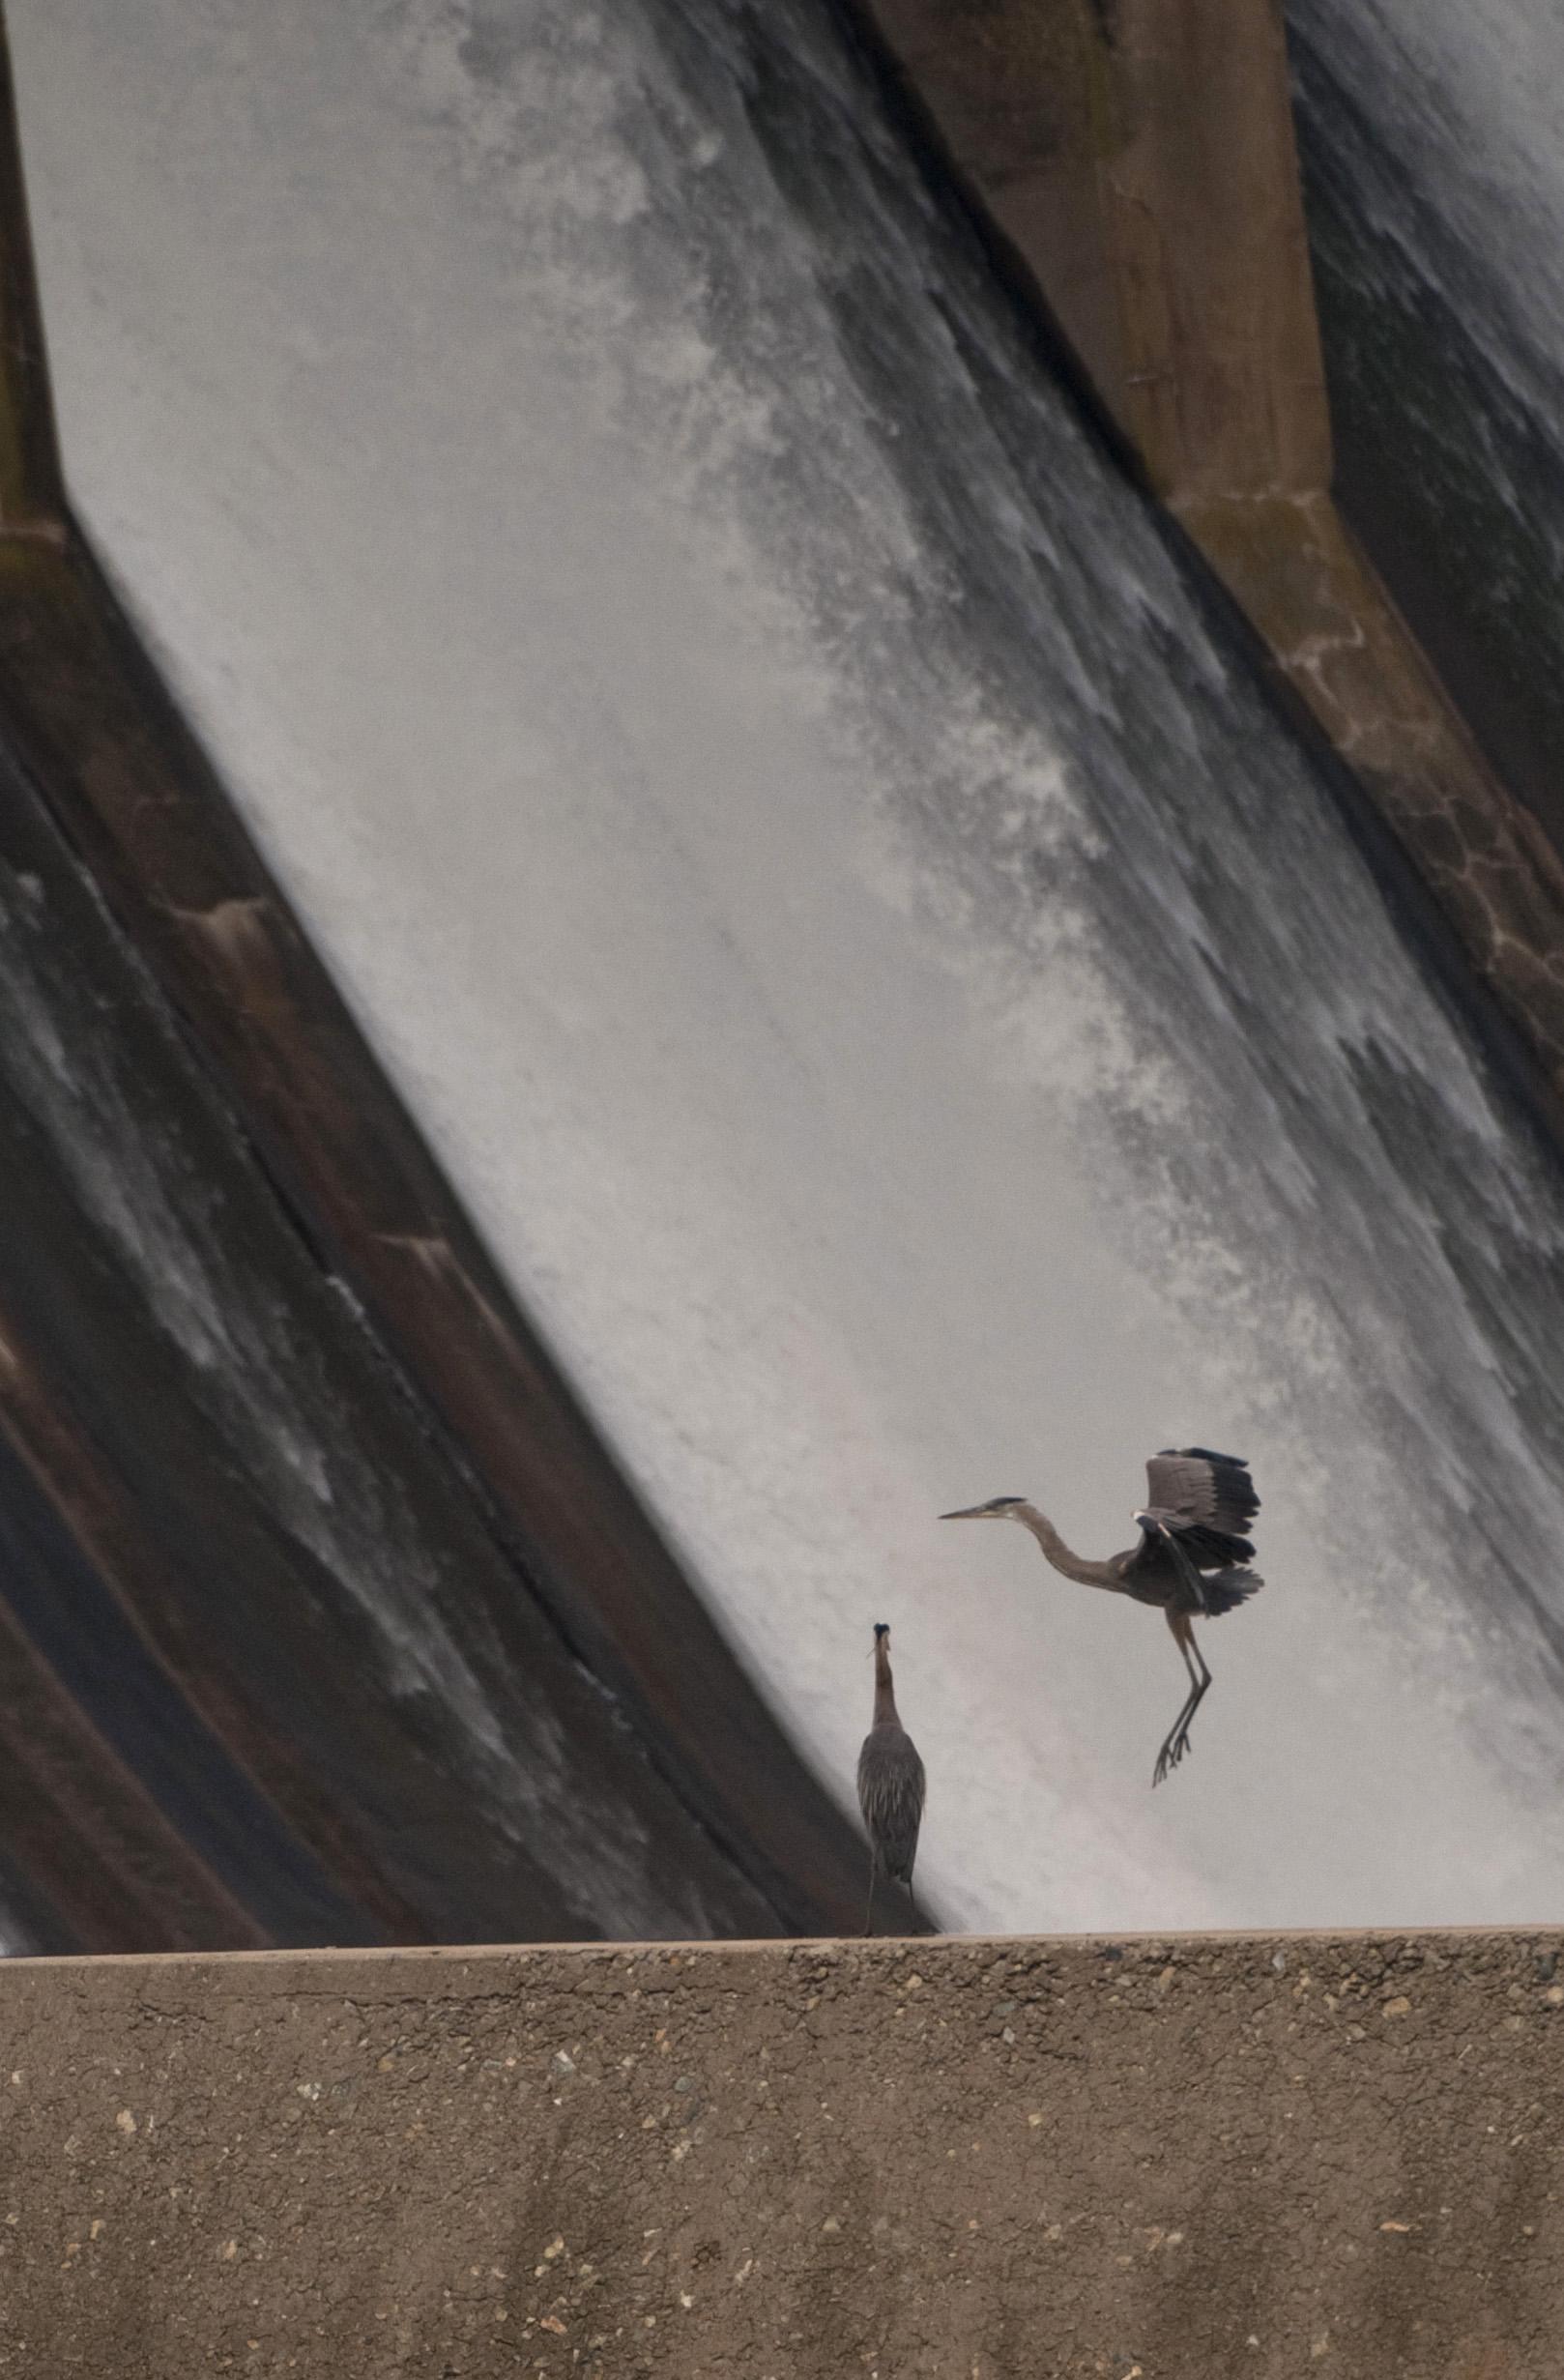 heron lands on Conowingo Dam